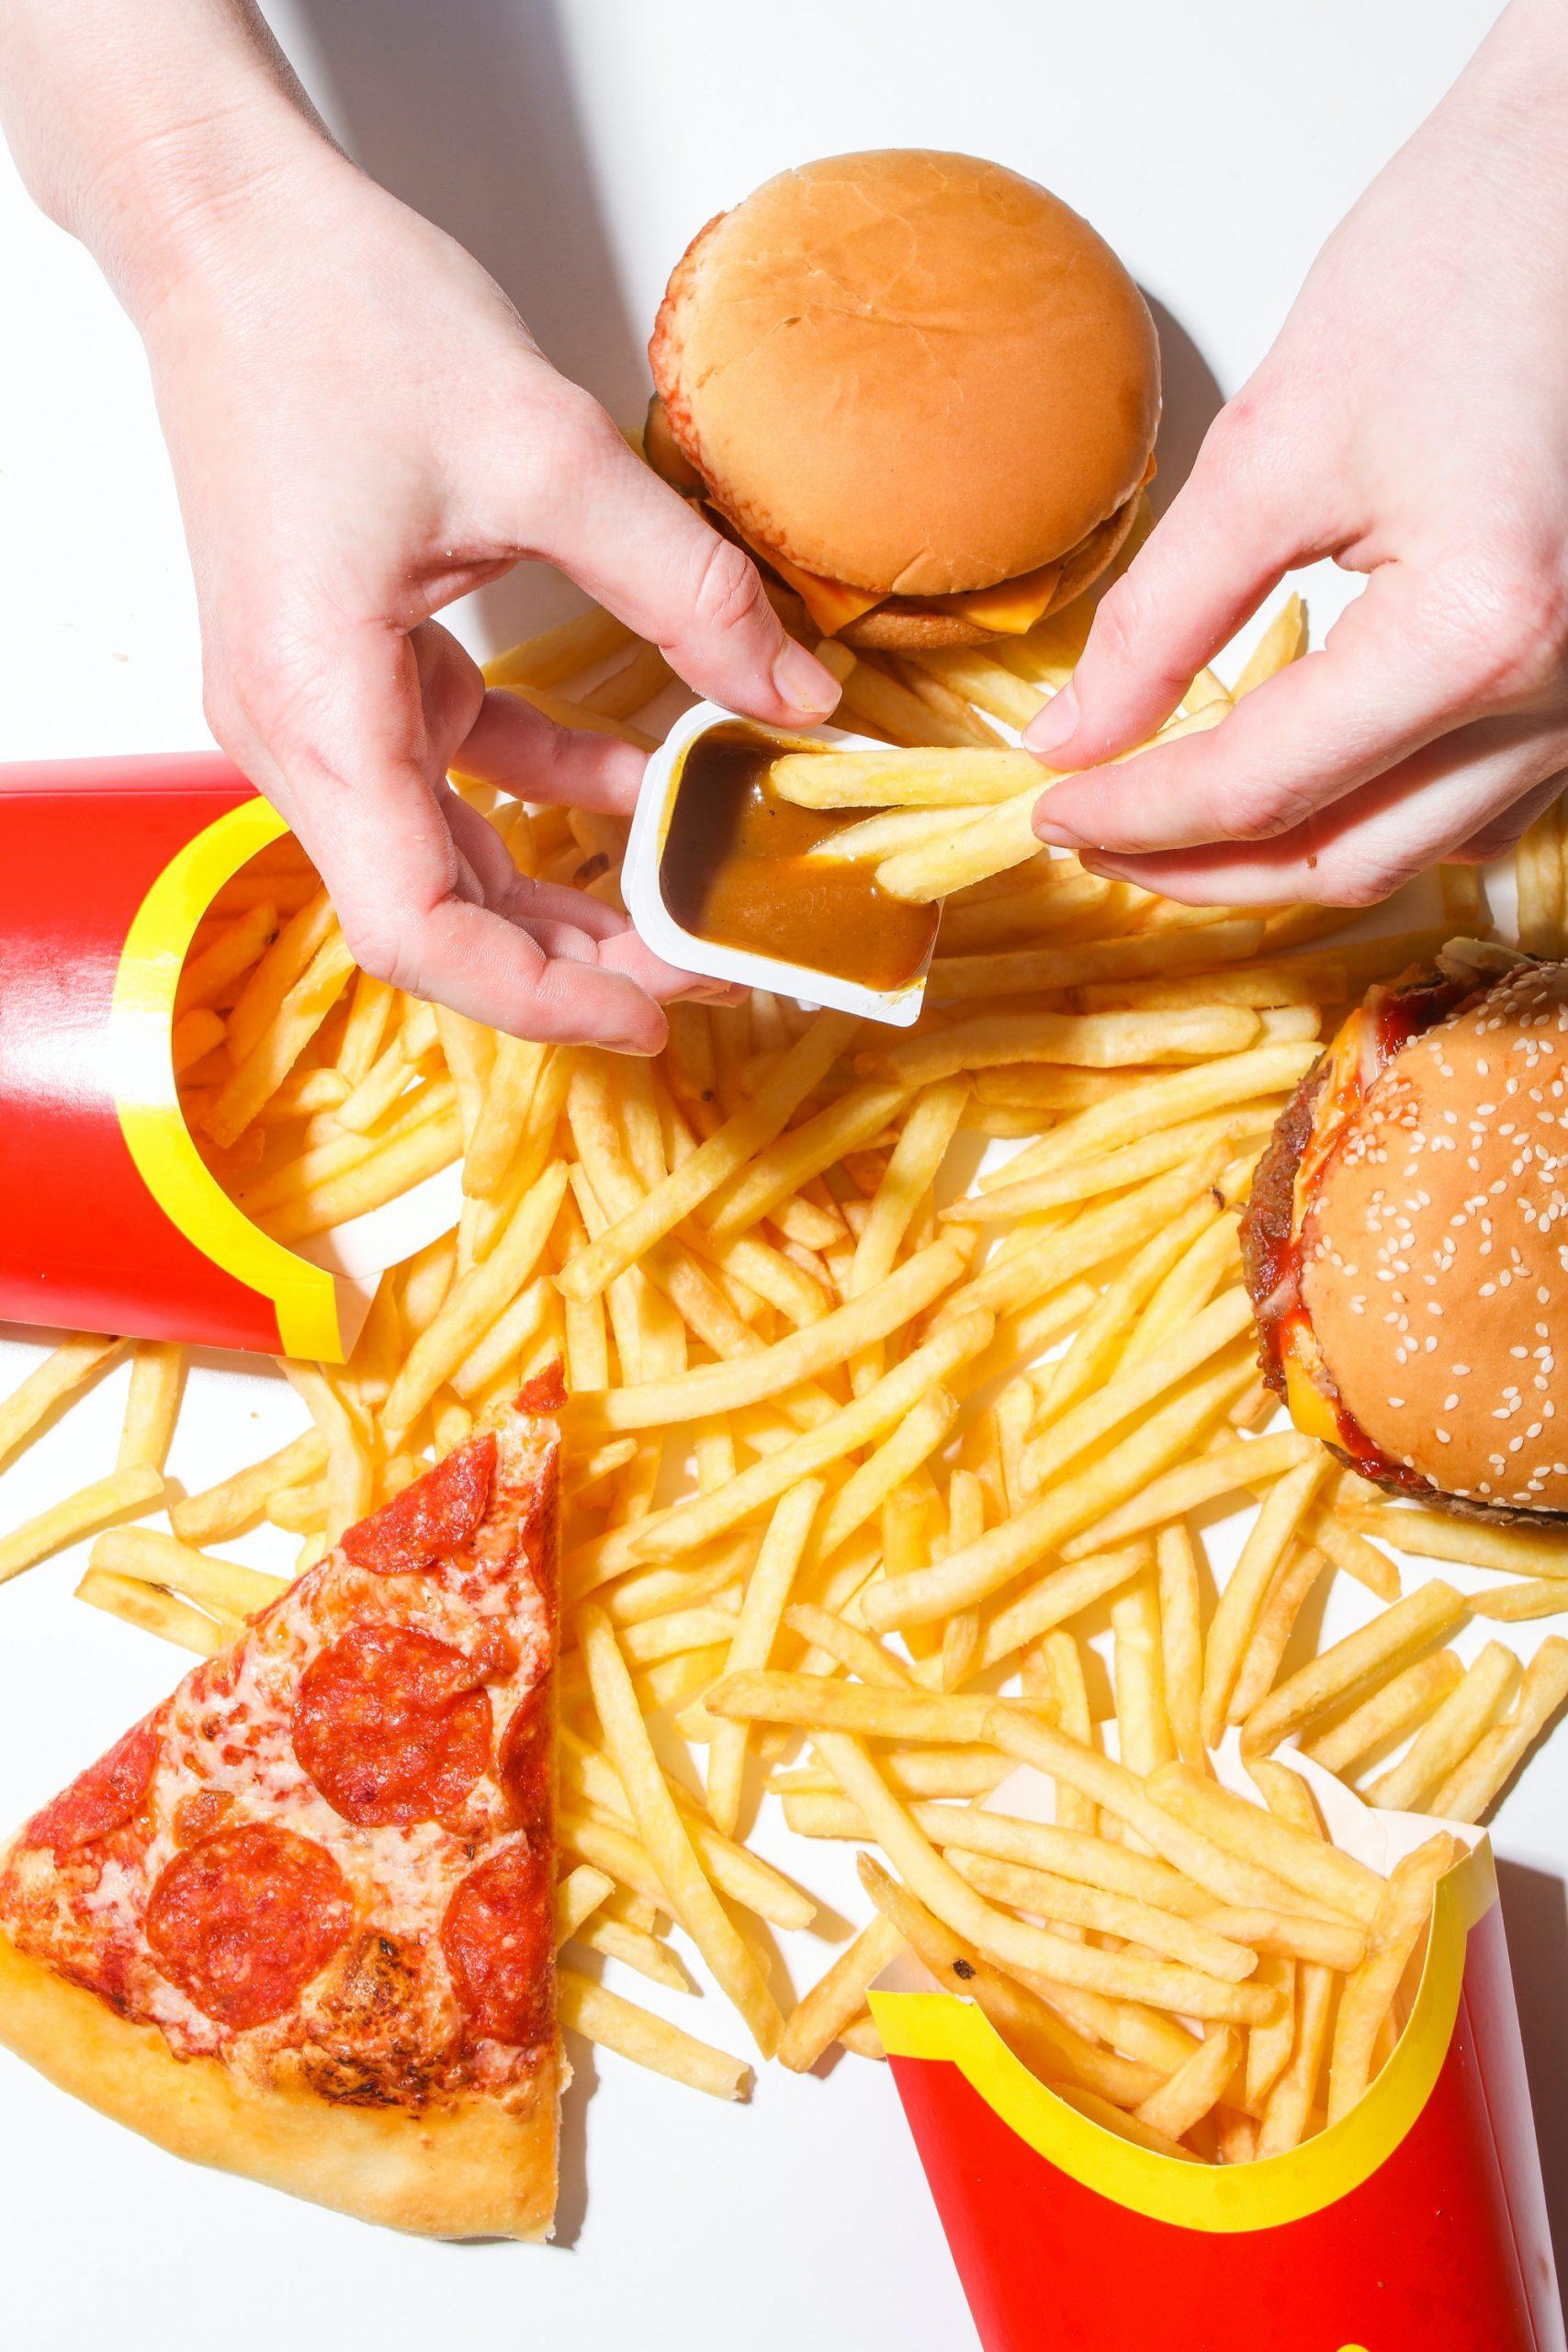 tiktoker transforma comida rápida en platillos gourmet